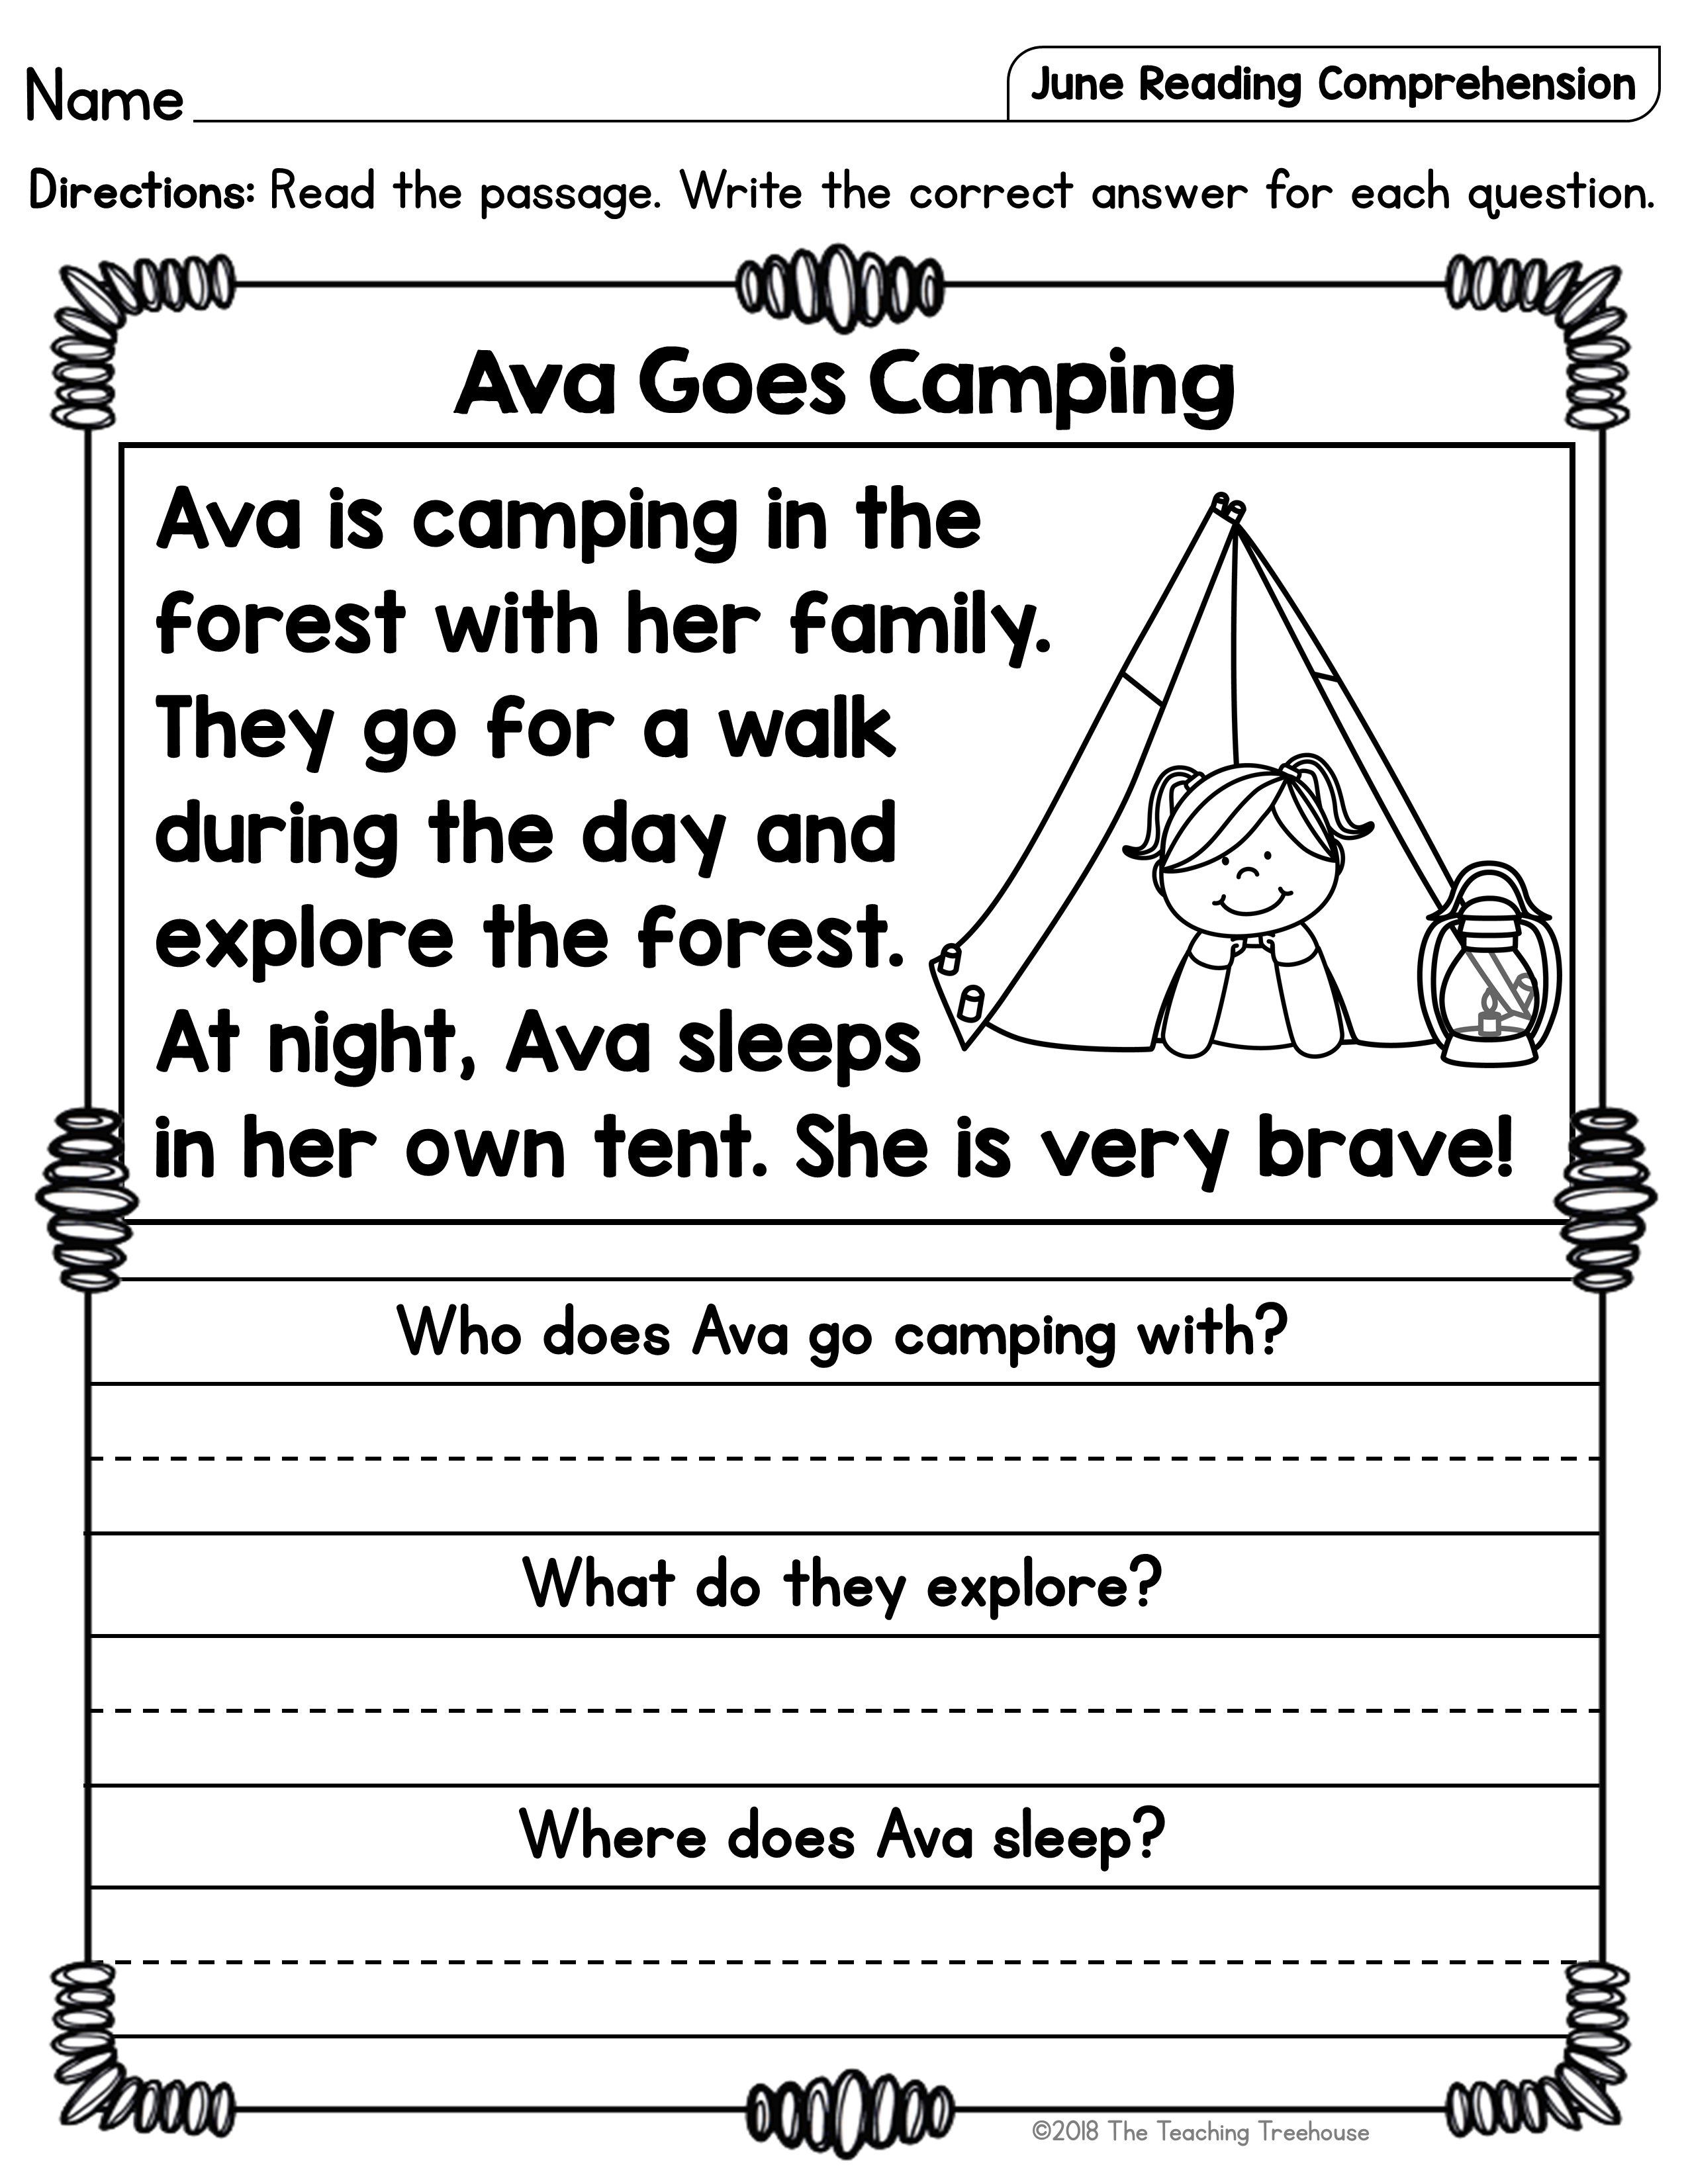 June Reading Comprehension Passages for Kindergarten and First Grade    Reading comprehension worksheets [ 3300 x 2550 Pixel ]